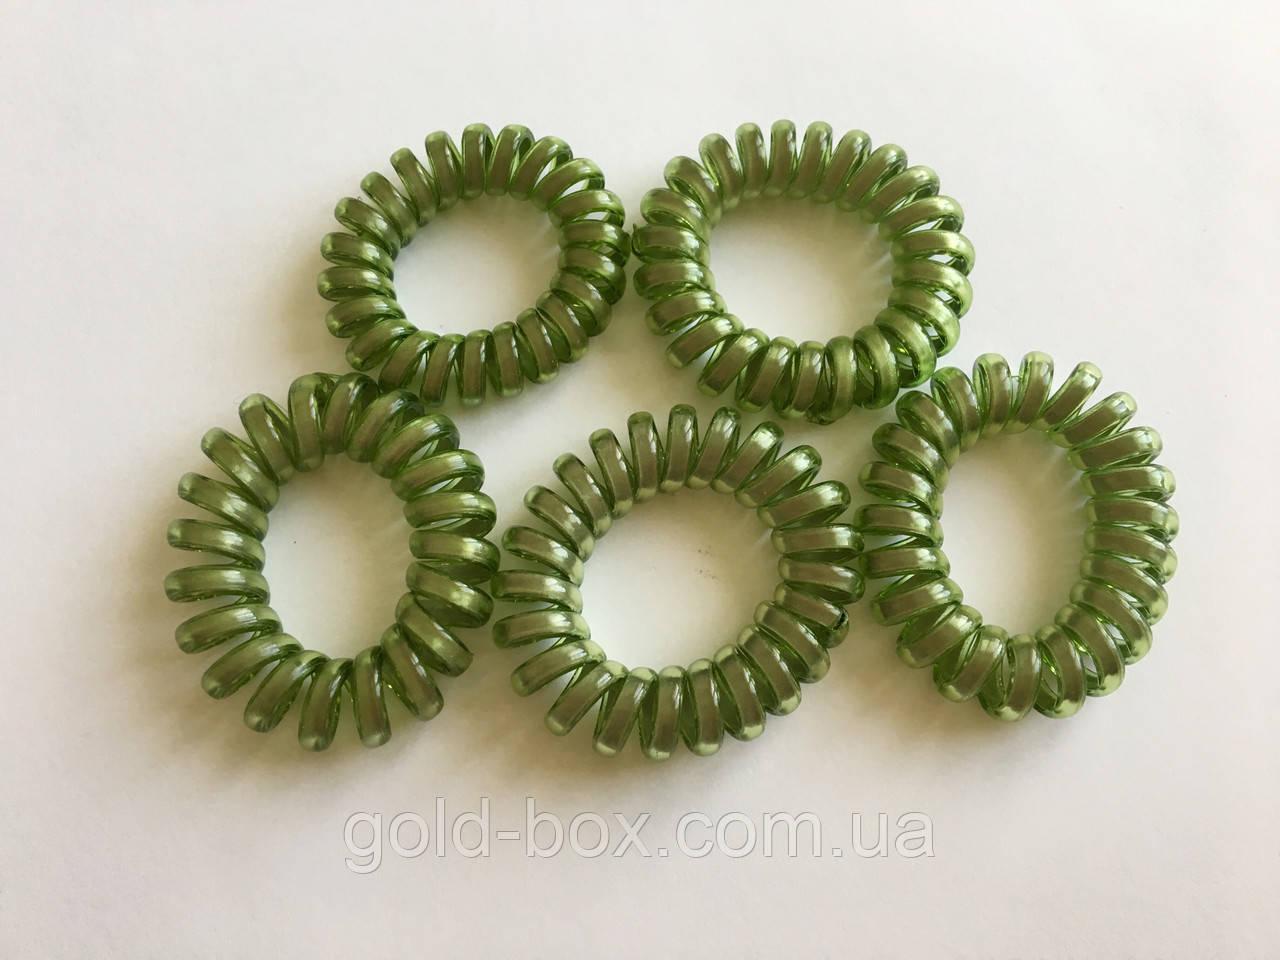 Резинки «Спиралька» набор 5 шт зелень